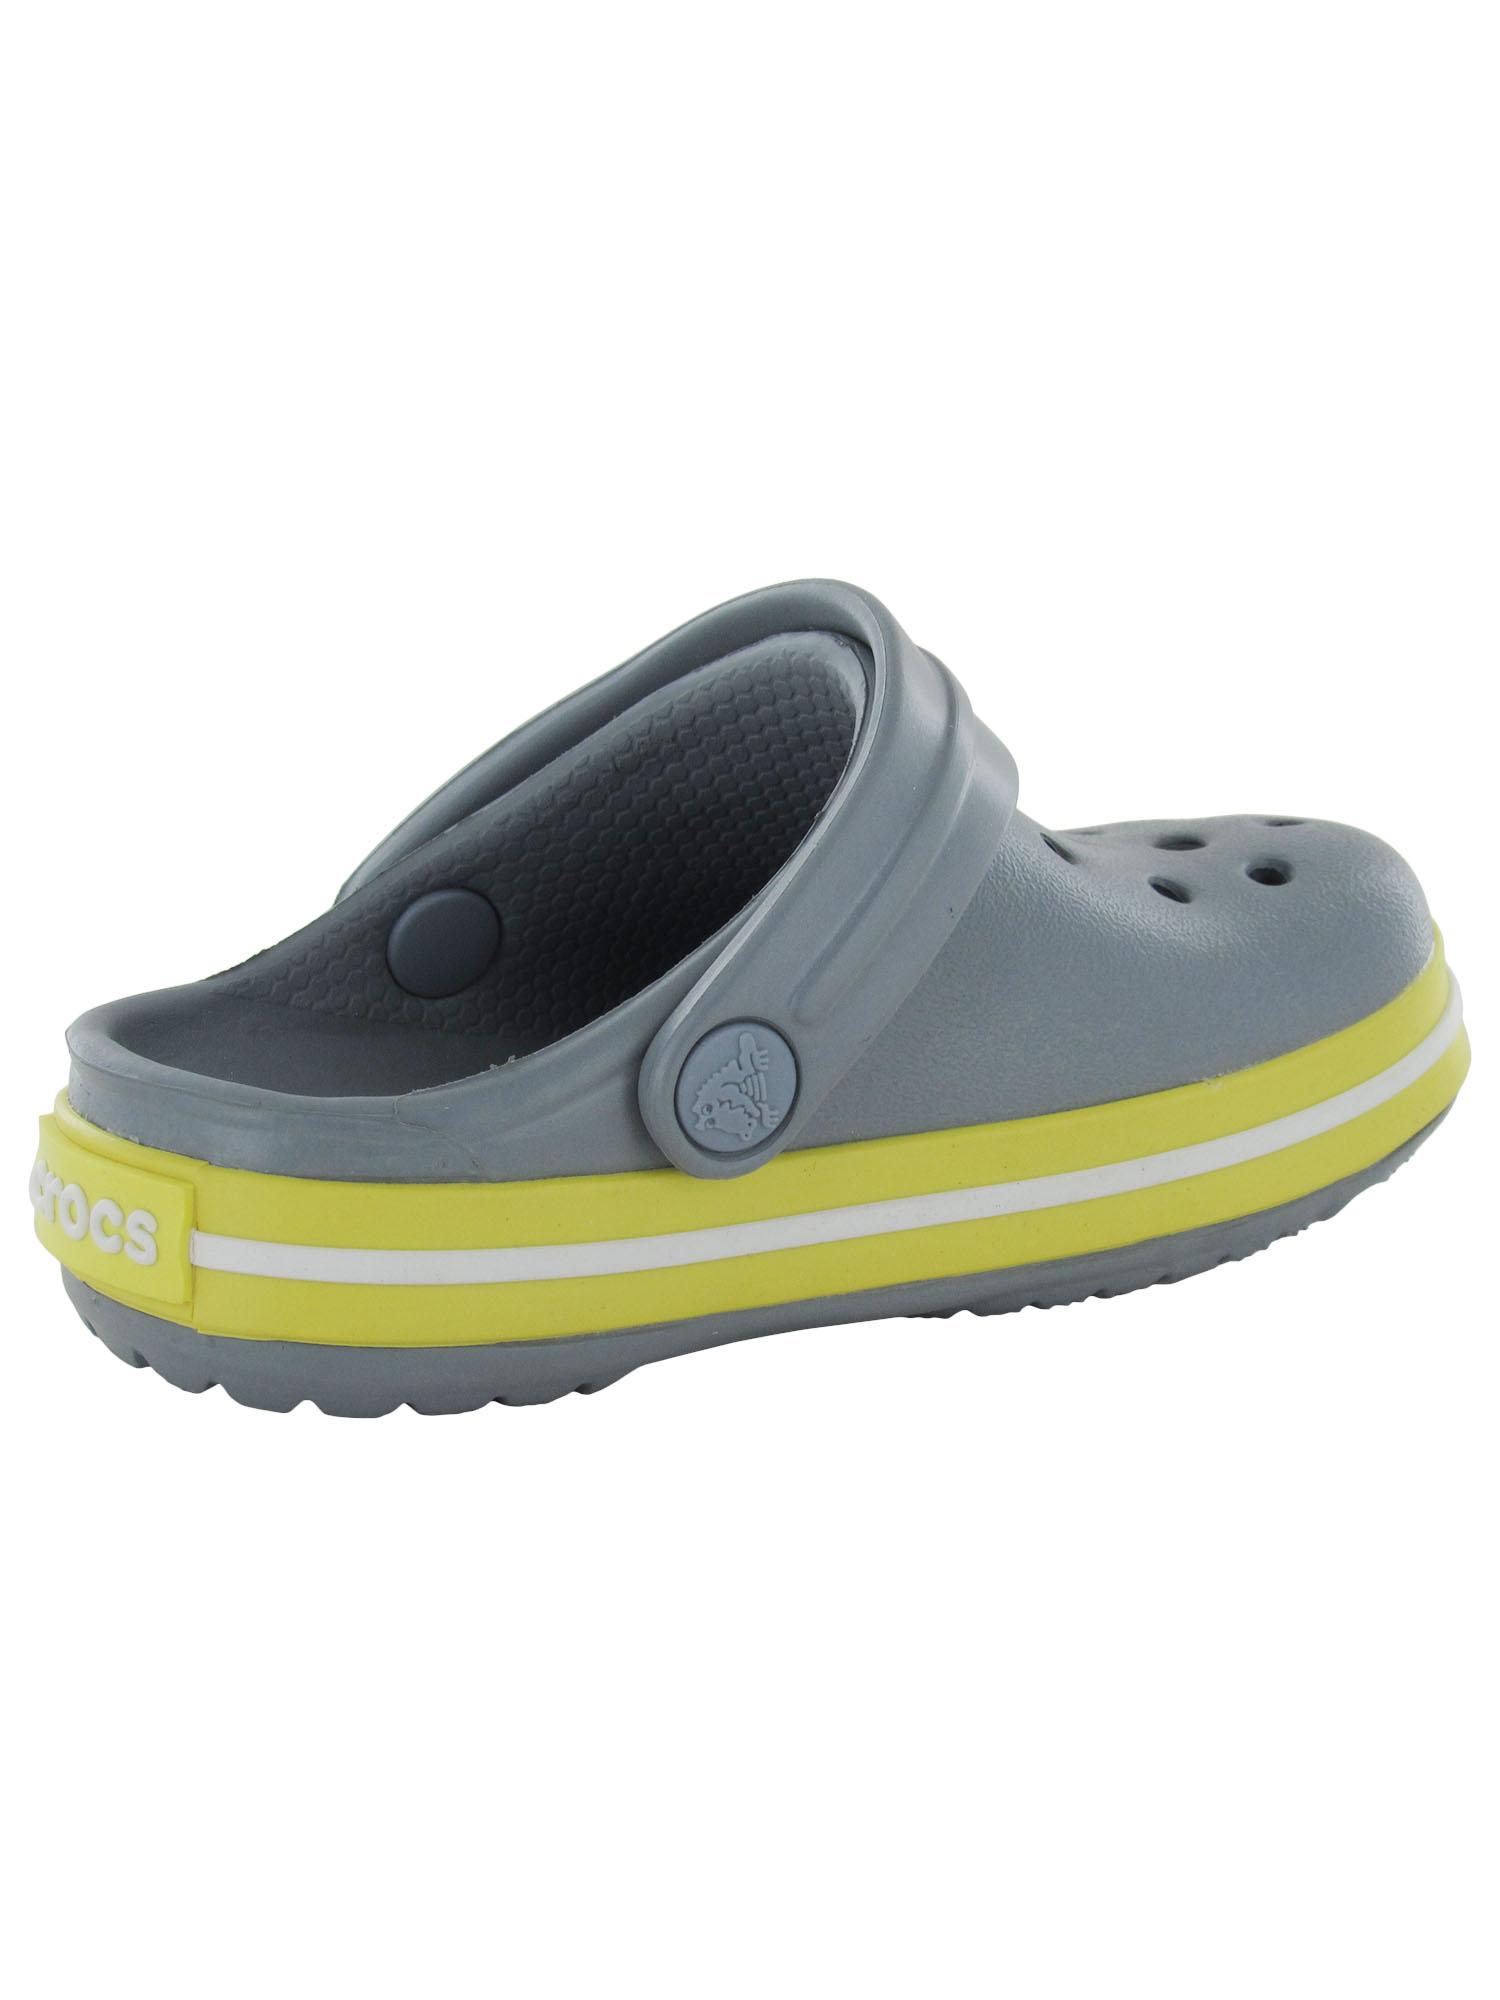 Crocs-Crocband-Kids-Slip-On-Clog-Shoes thumbnail 4